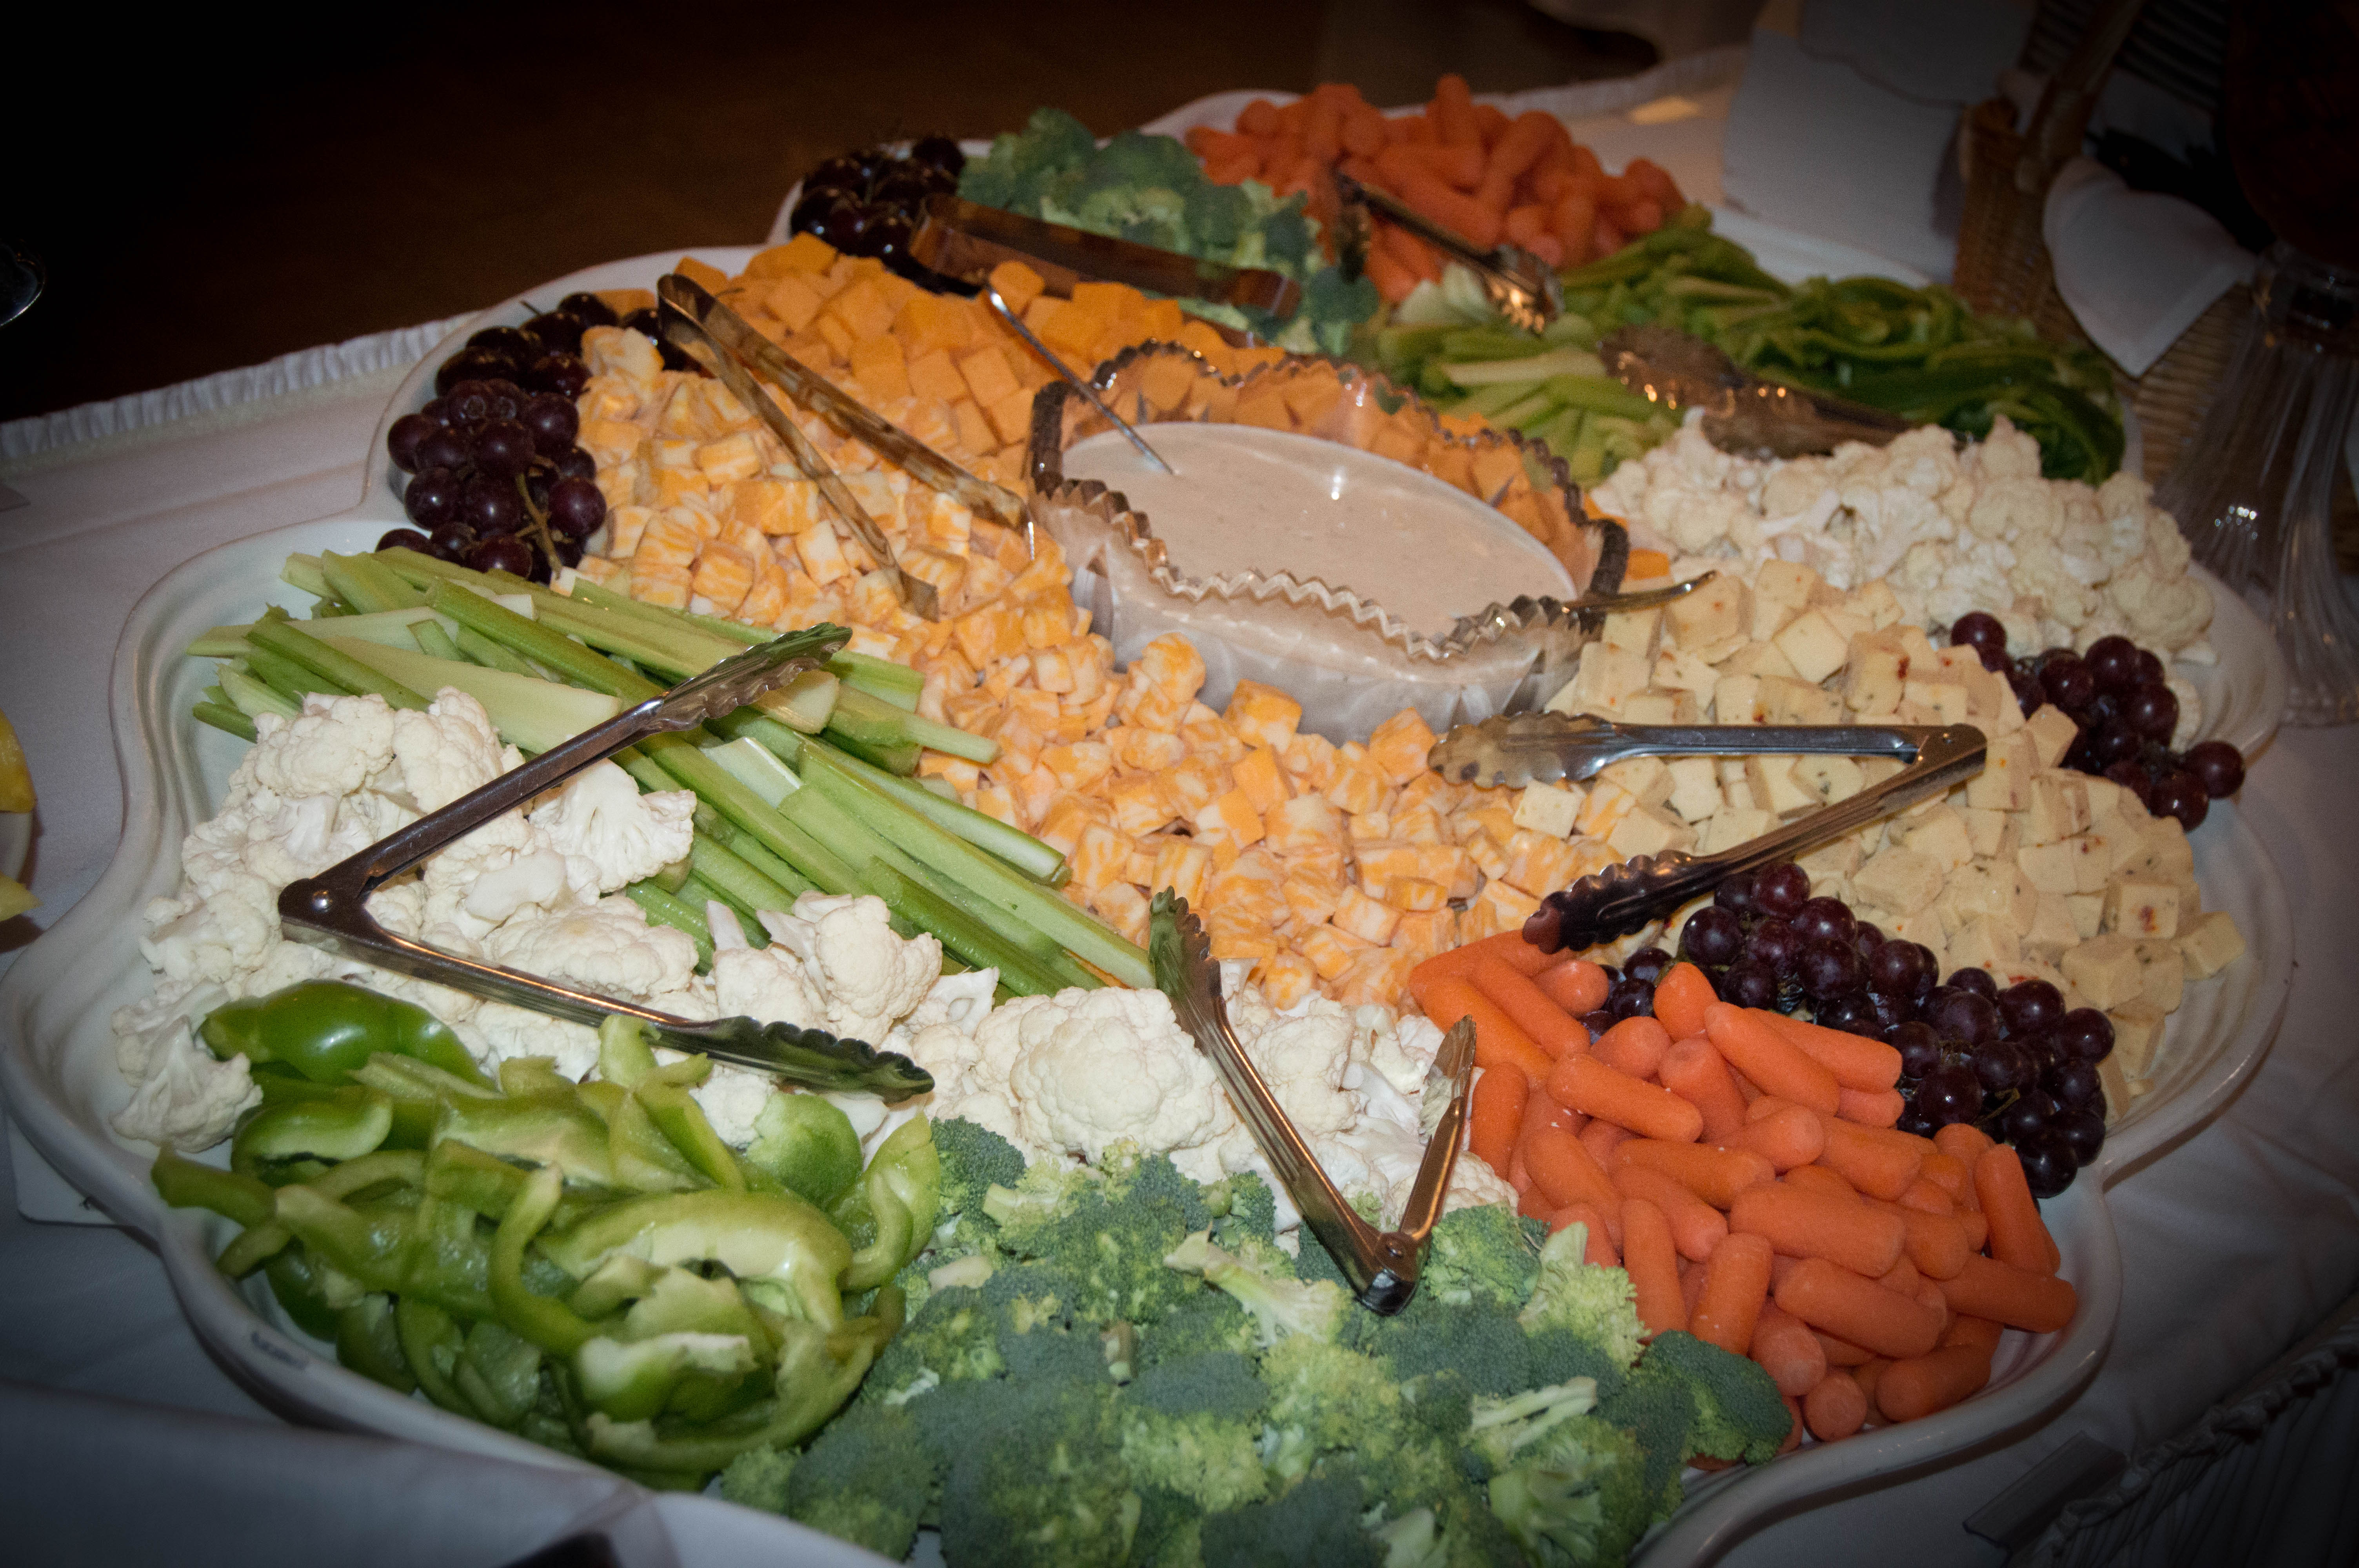 cheese and veggie tray